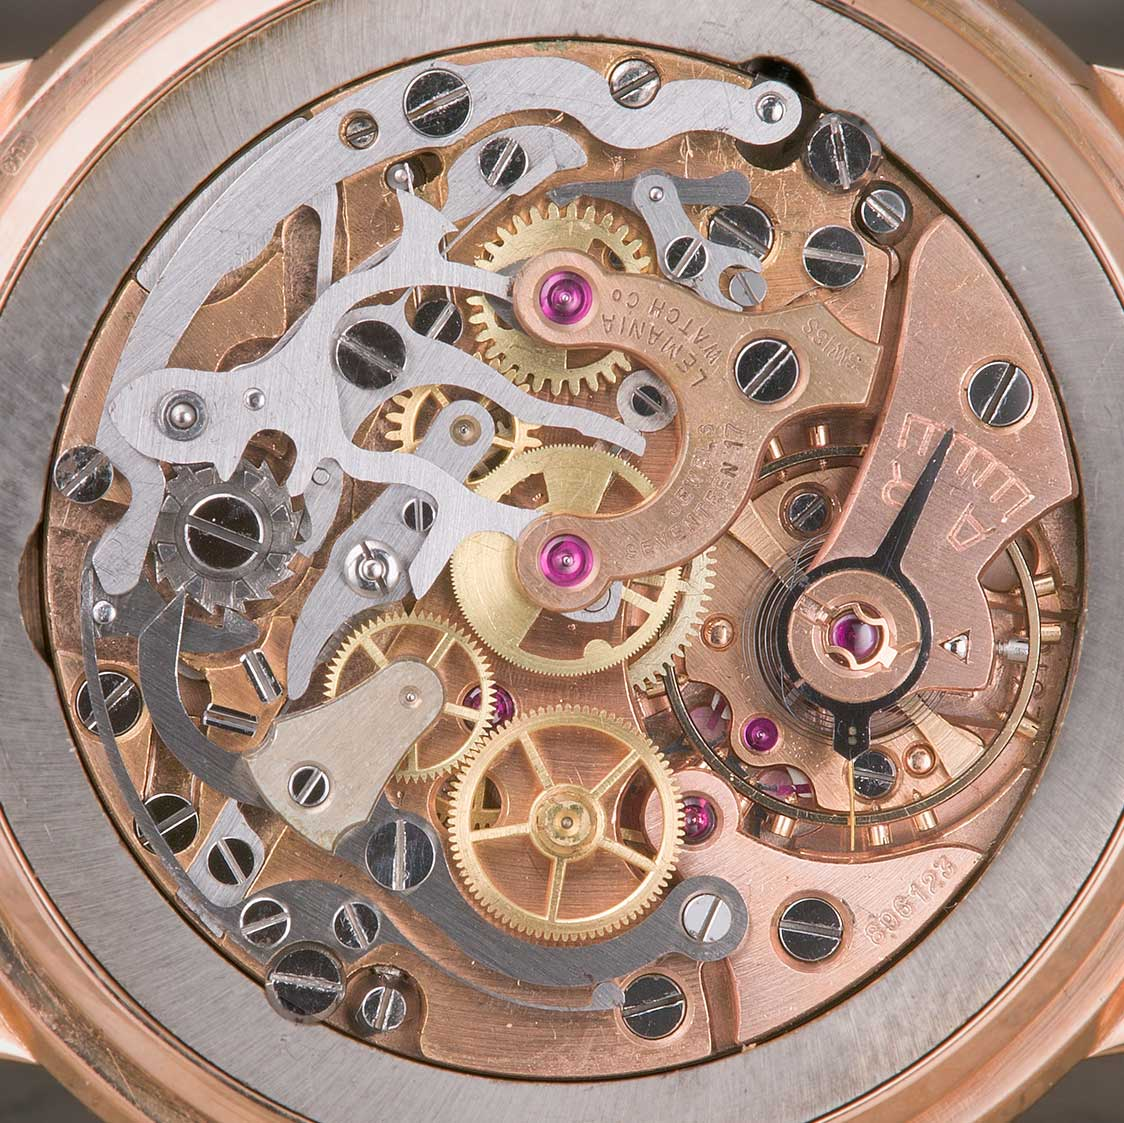 Open caseback on a 1950s Lemania Chronograph in rose gold, showcasing a Lemania 2310 chronograph movement (Image: ninanet.net; SteveG's Watch Launchpad)